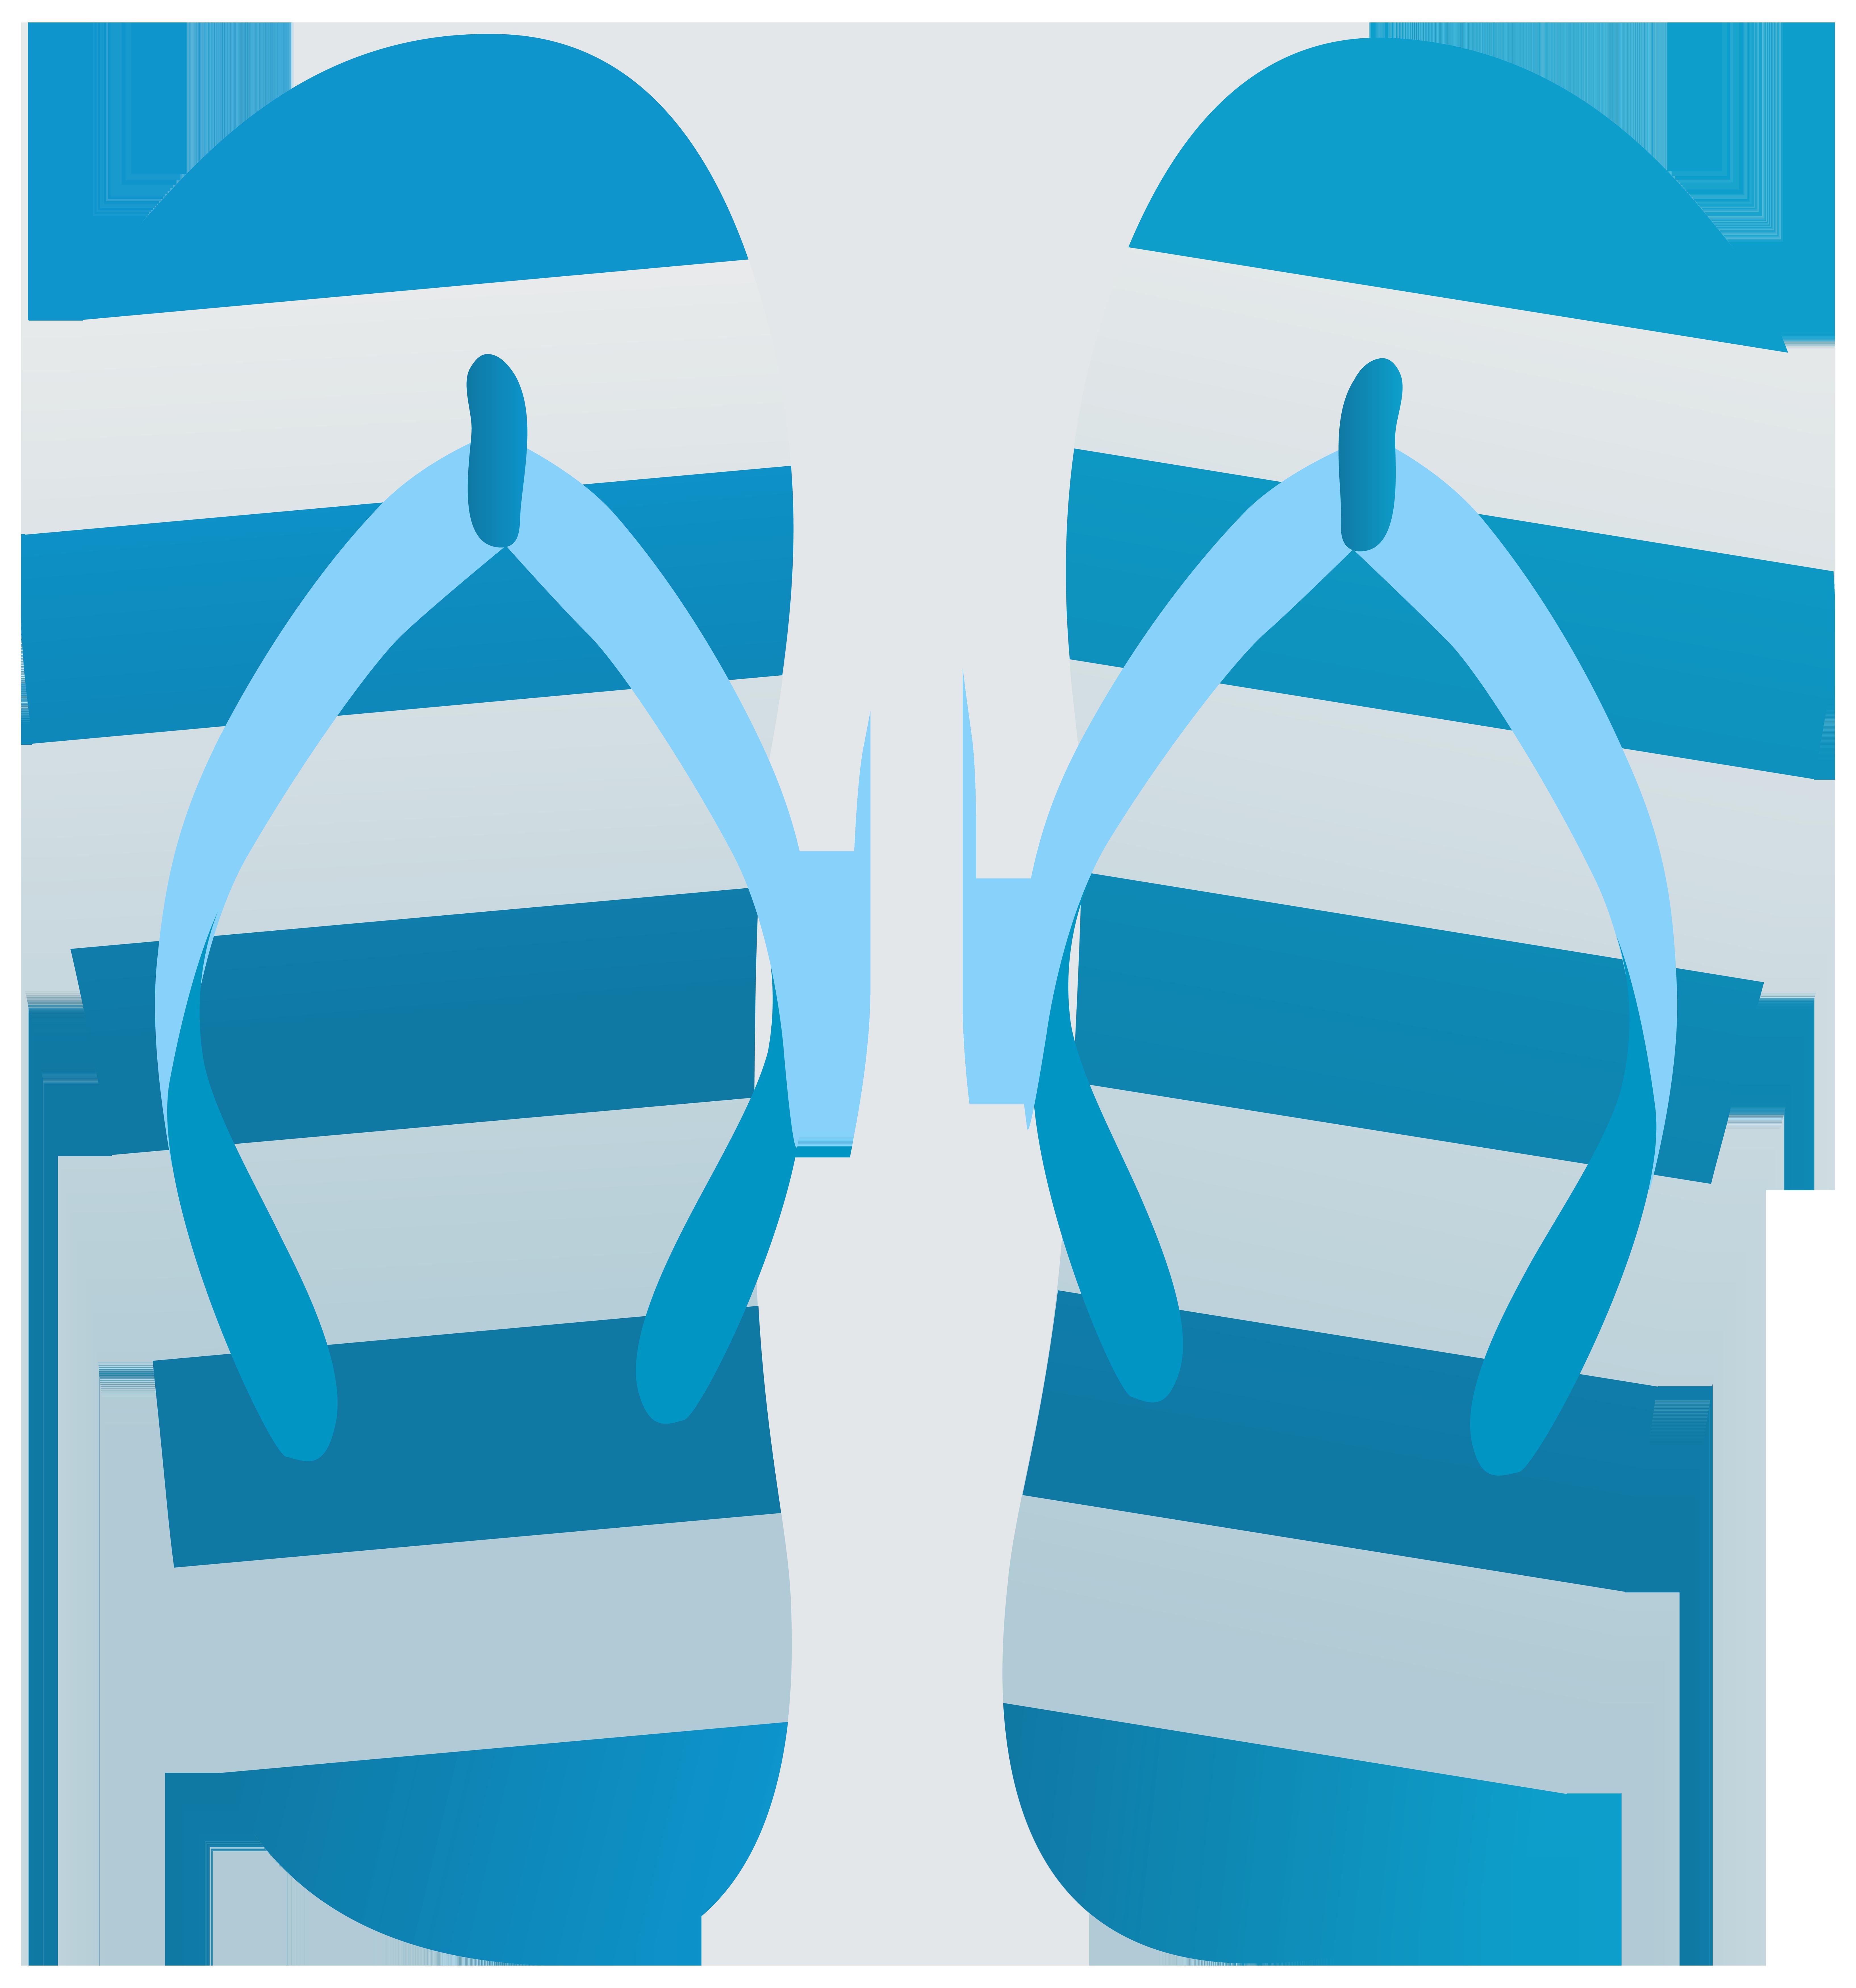 Transparent background clip art flip flop clipart clip freeuse stock Blue Flip Flops Transparent Clip Art Image | Gallery Yopriceville ... clip freeuse stock